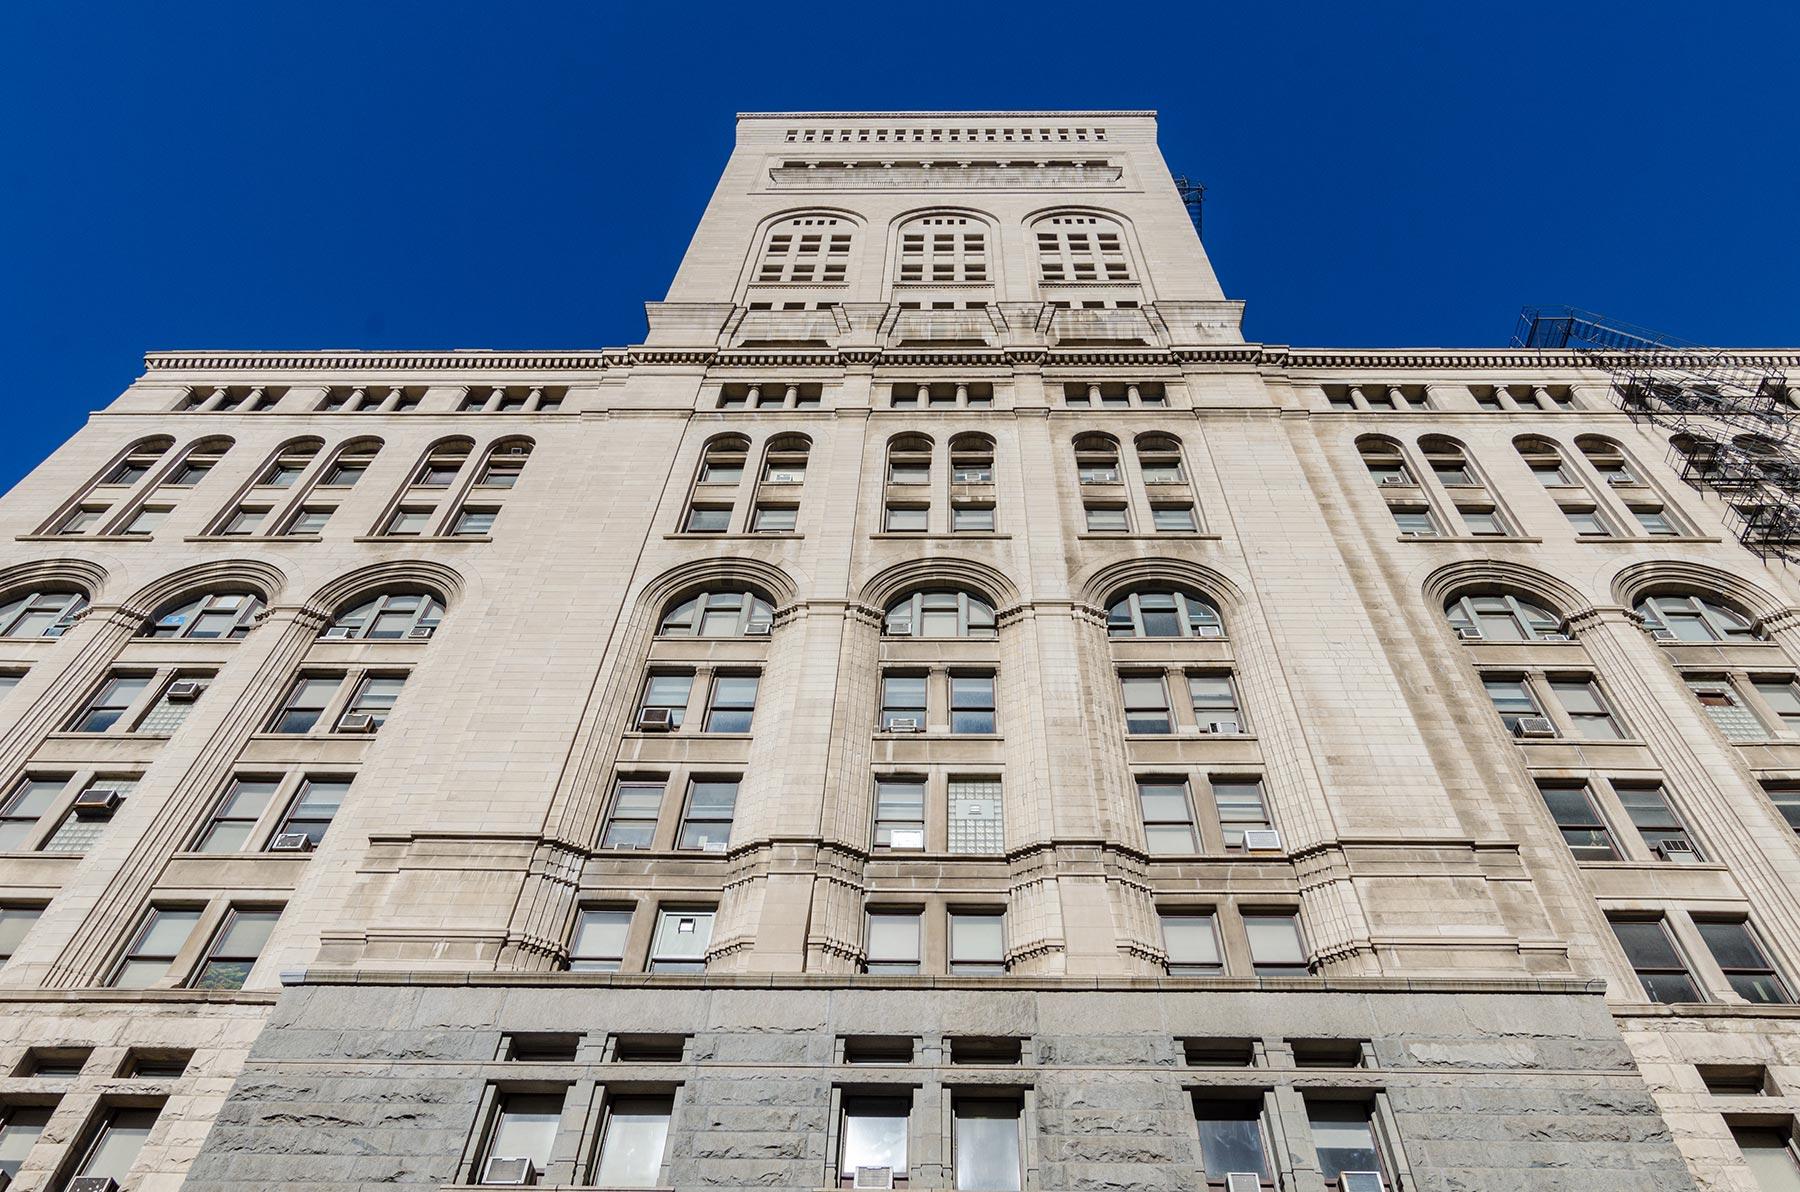 Alder & Sullivan's Auditorium Building, 50 E. Congress. Photo by Eric Allix Rogers